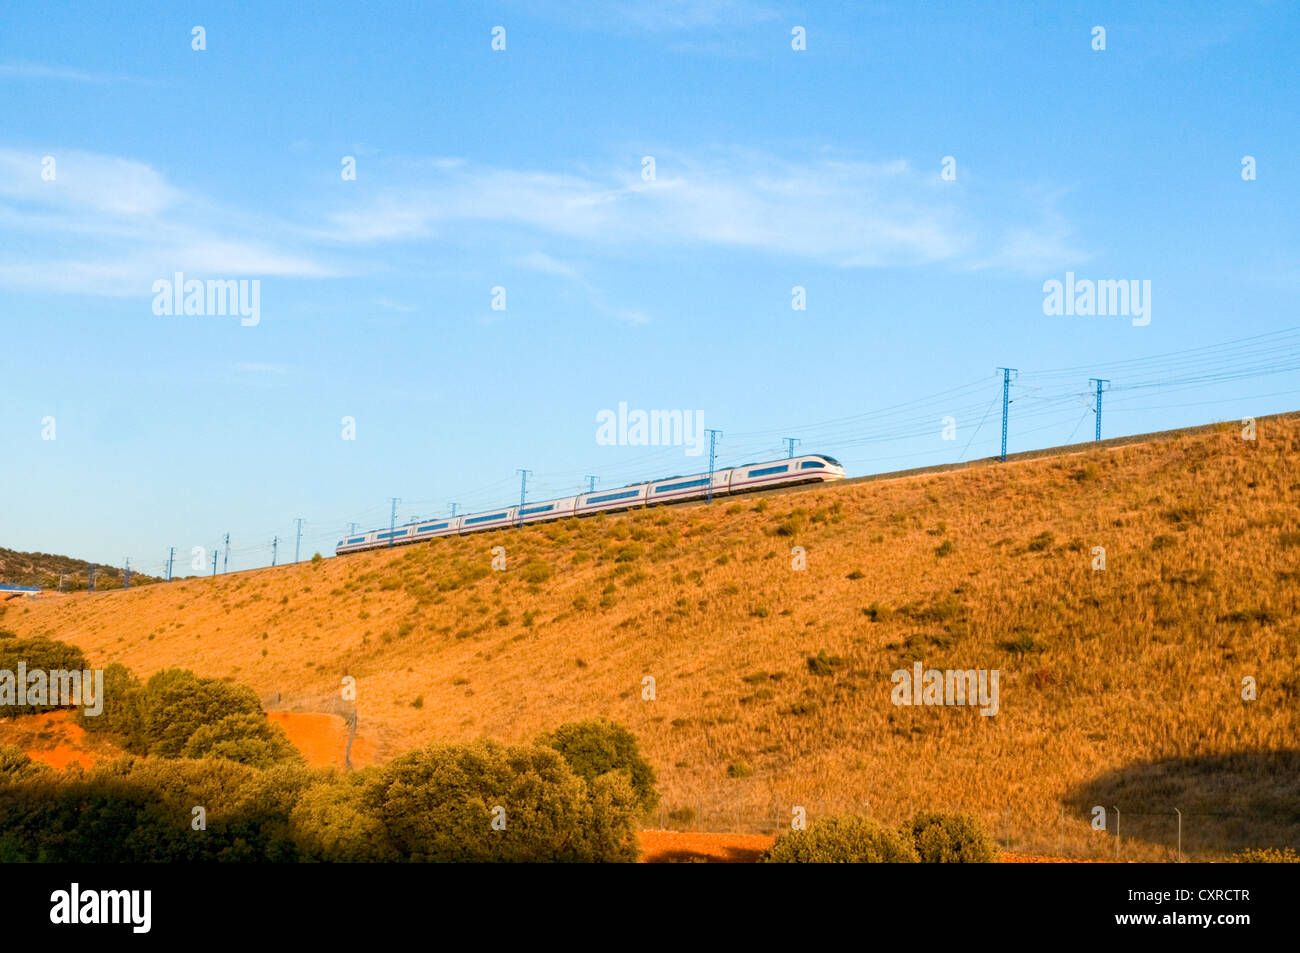 Madrid-Barcelona high-speed train traveling. Soria province, Castilla Leon, Spain. - Stock Image